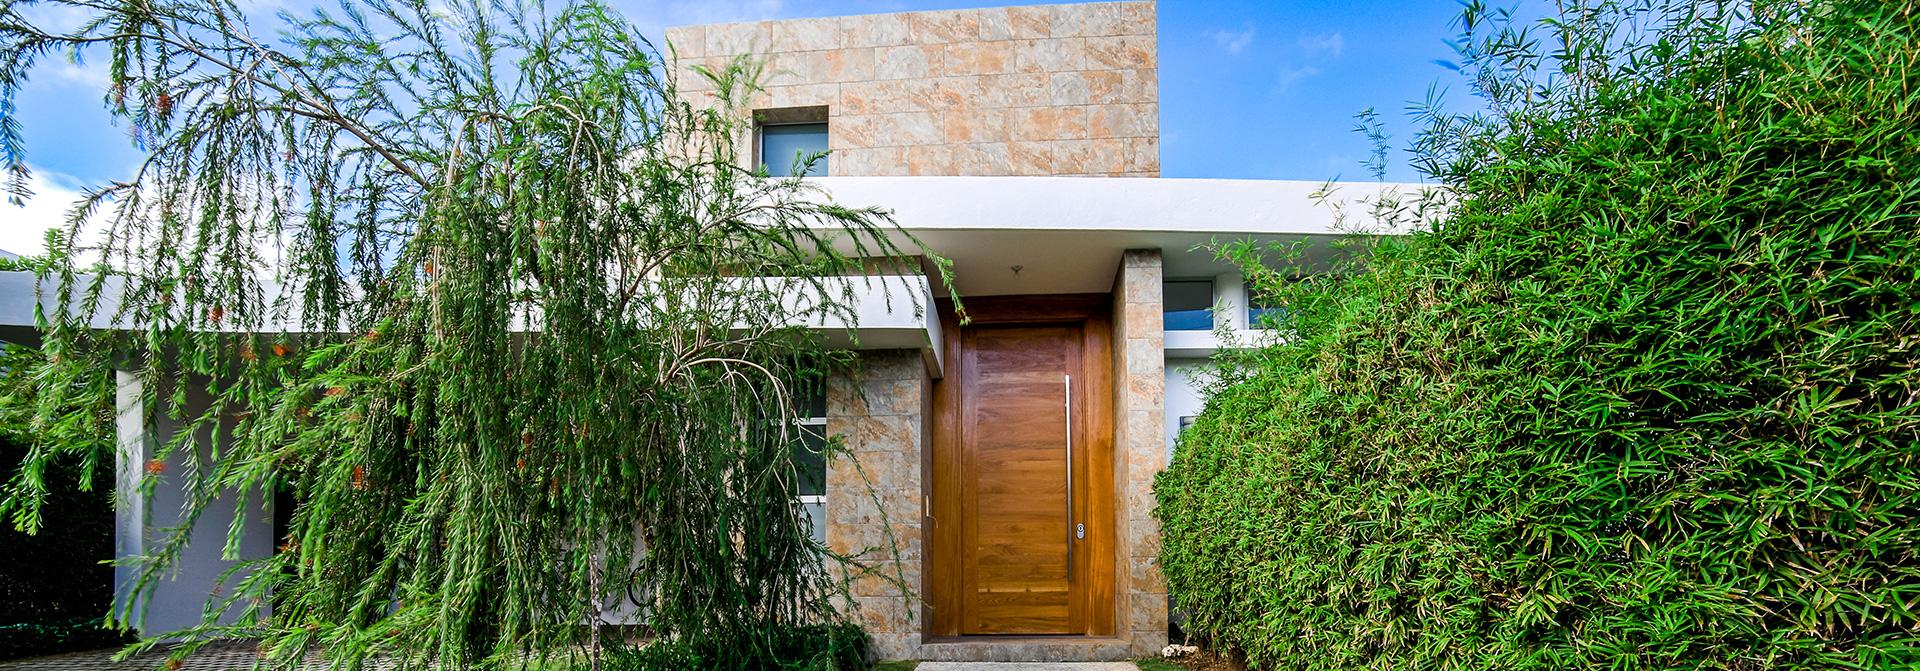 Homes & Homesites